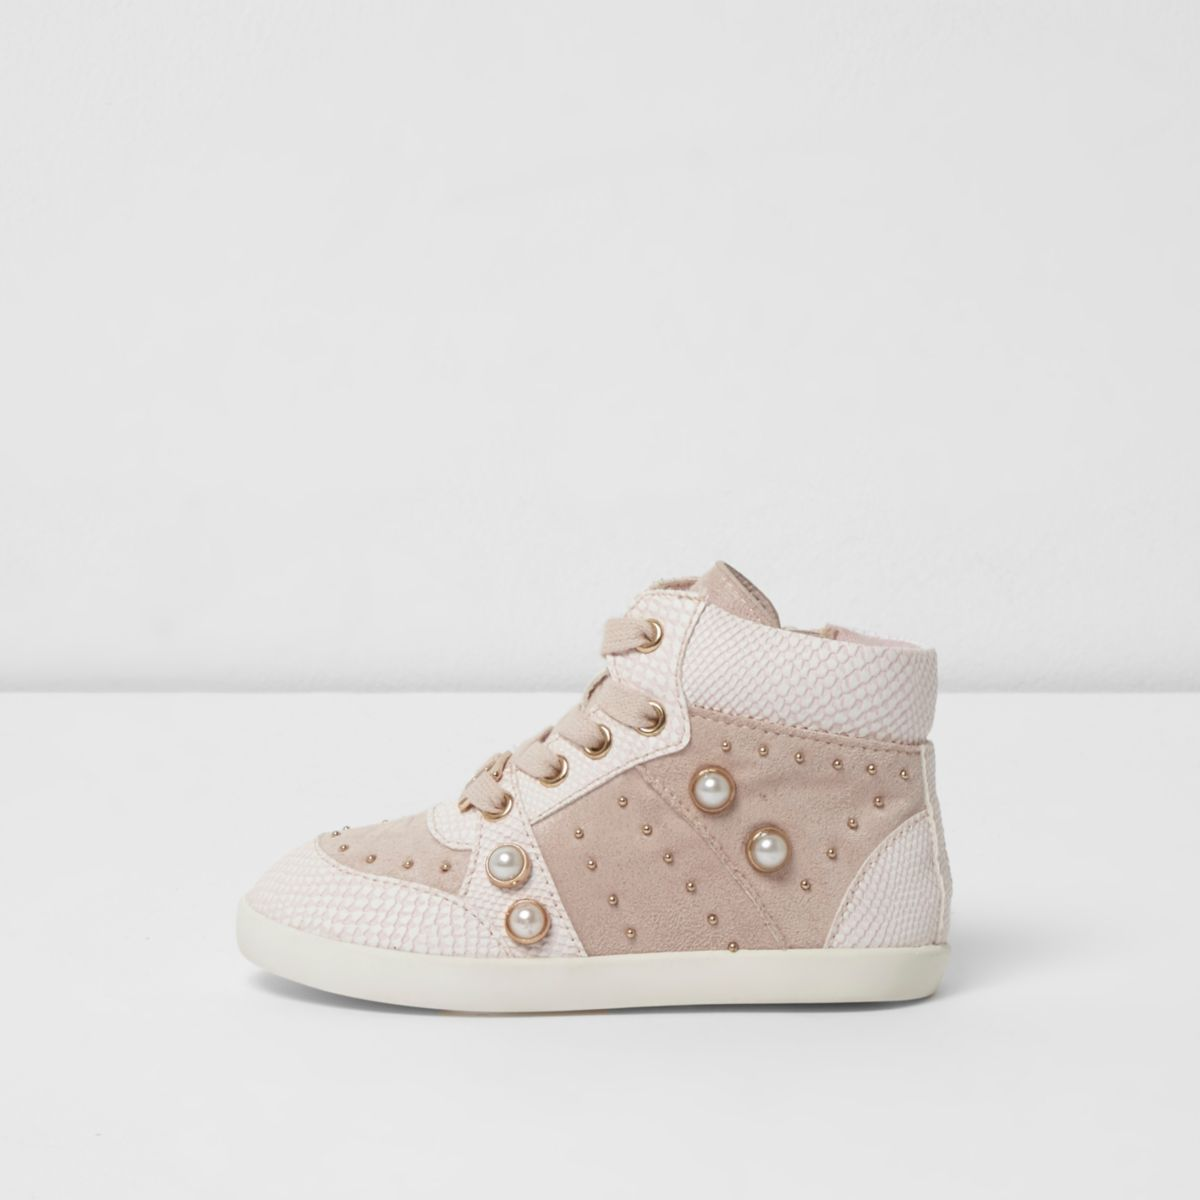 Pinke, hohe Sneaker mit Verzierung